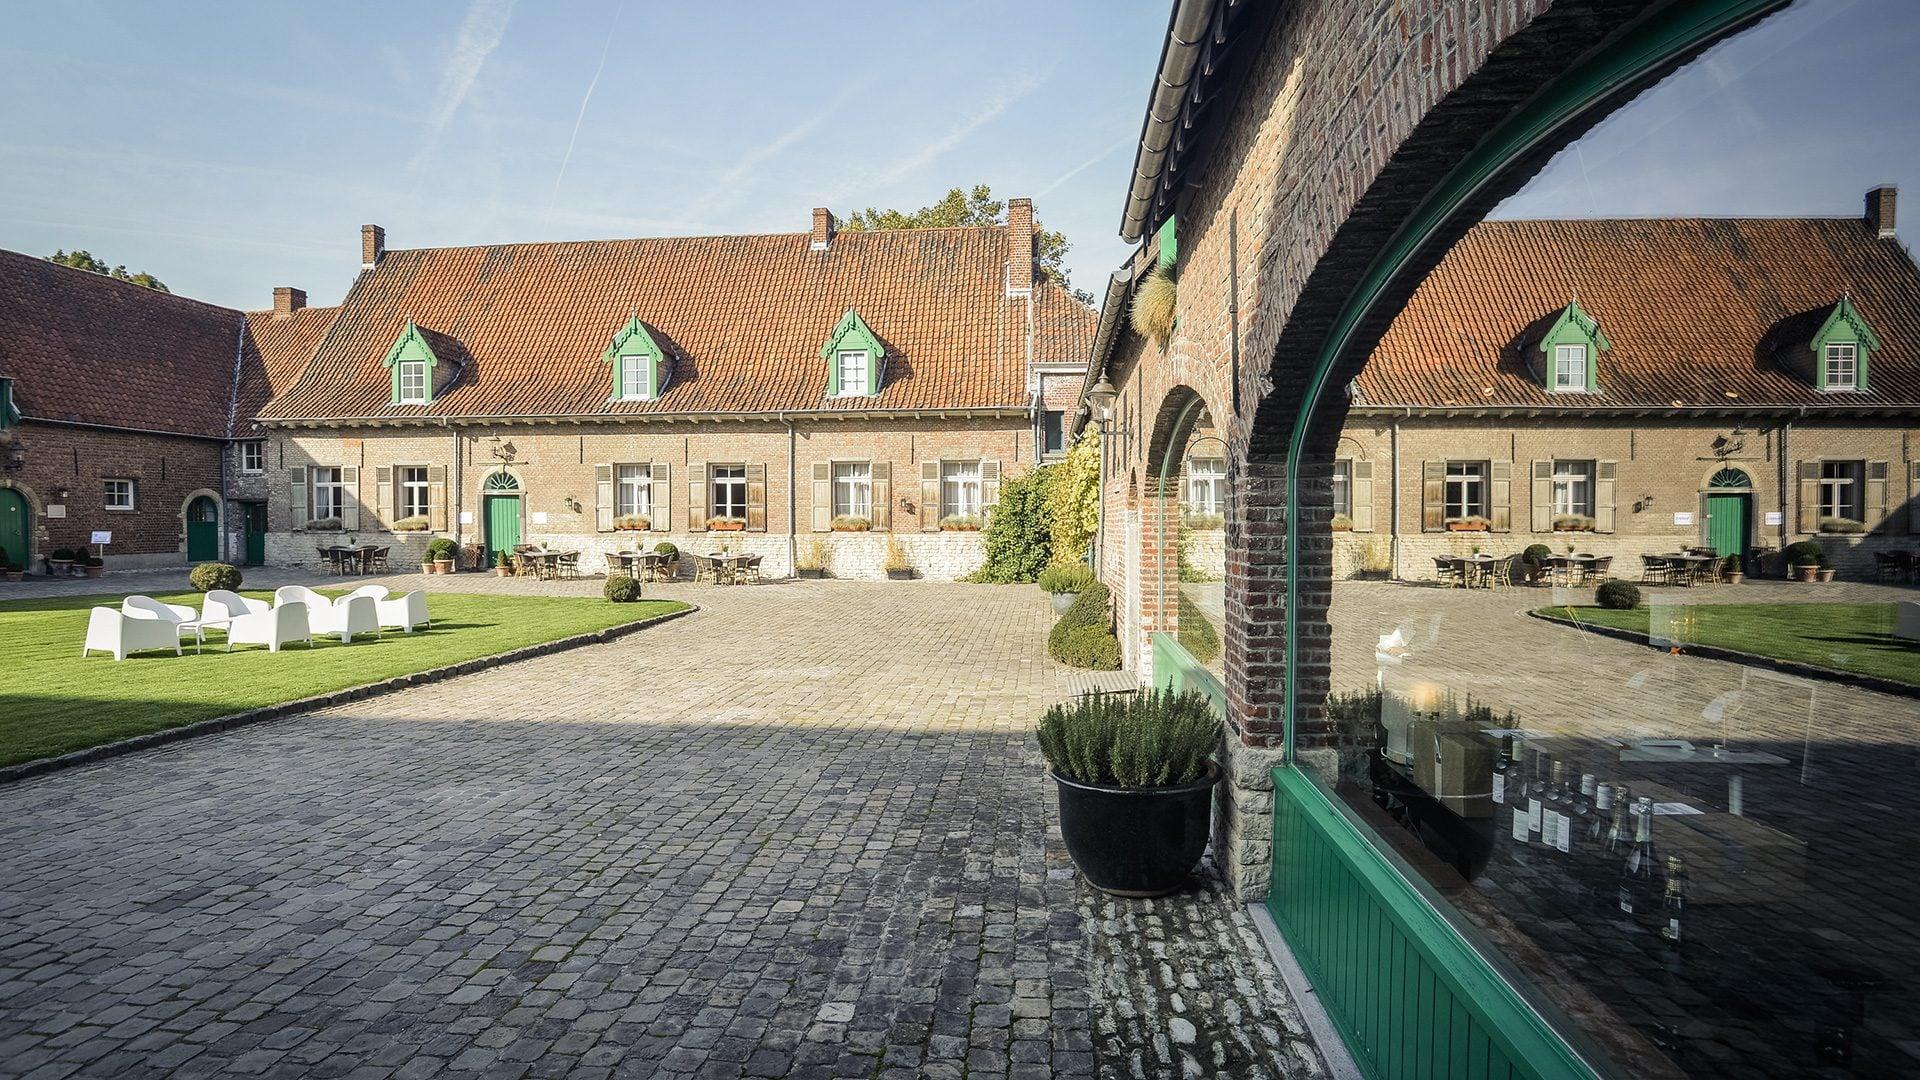 History - Salons de Romree